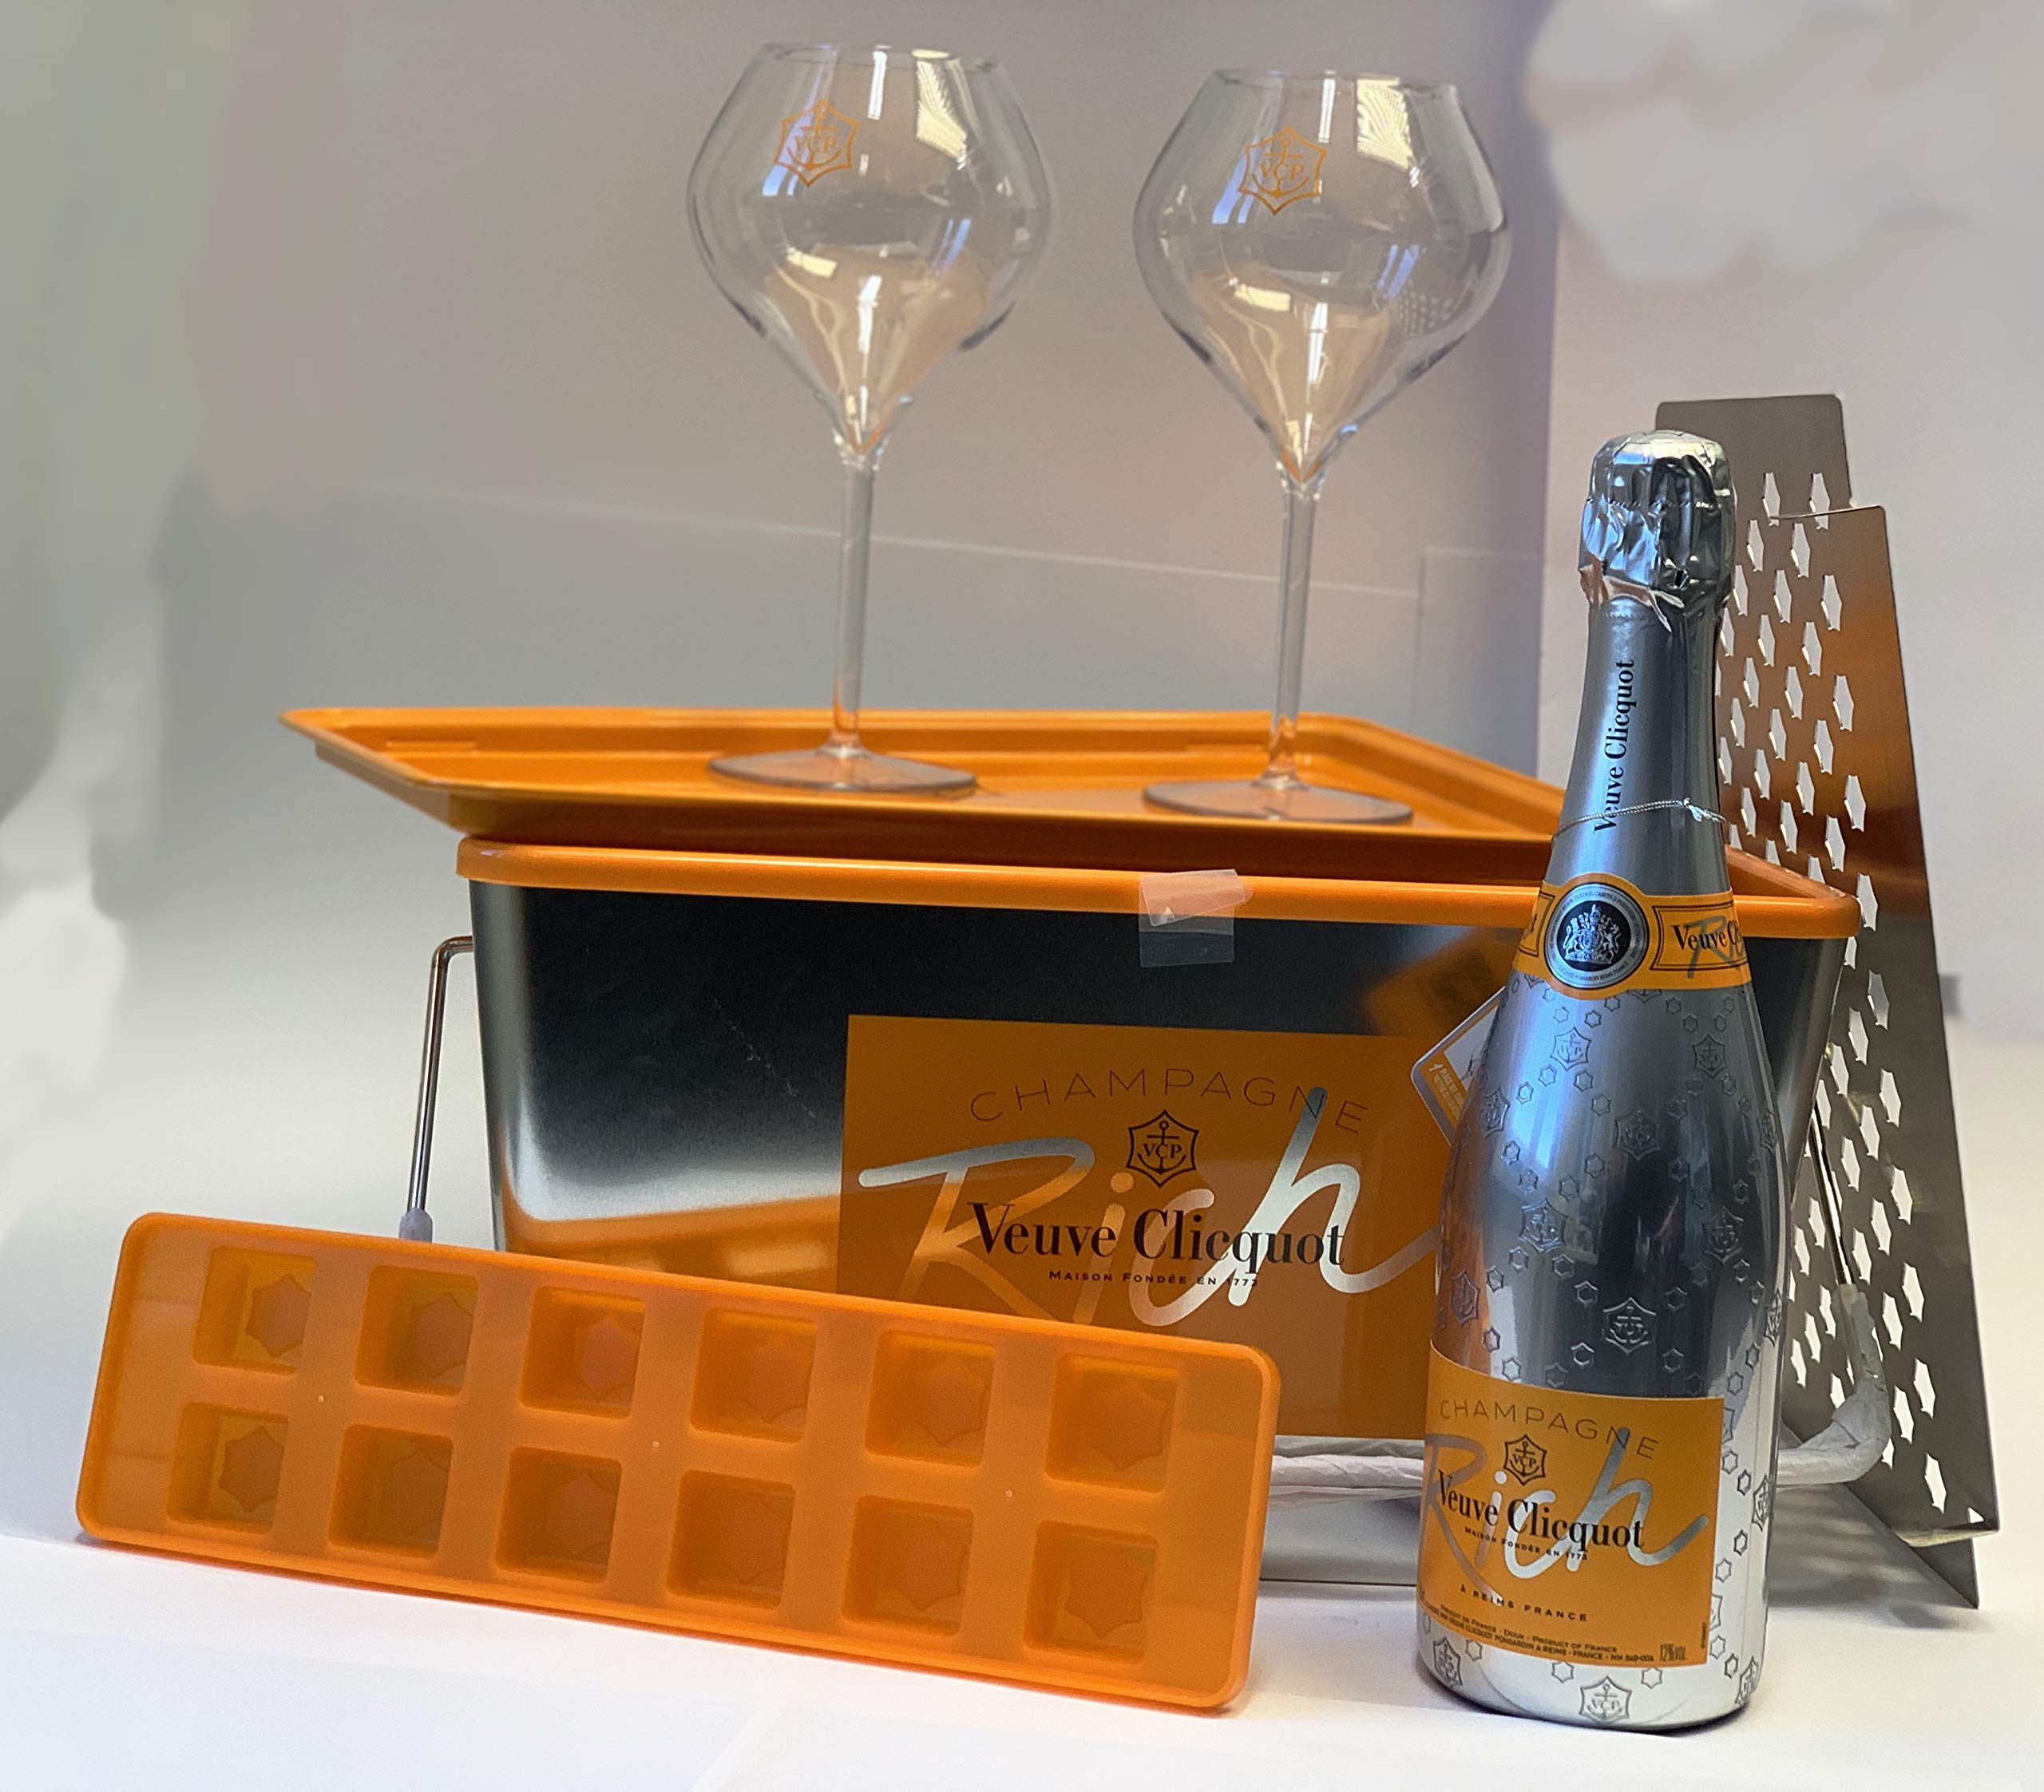 Veuve-Clicquot-Do-Rich-Yourself-Picknick-Set-075l-Champagner-Glser-12-Vol